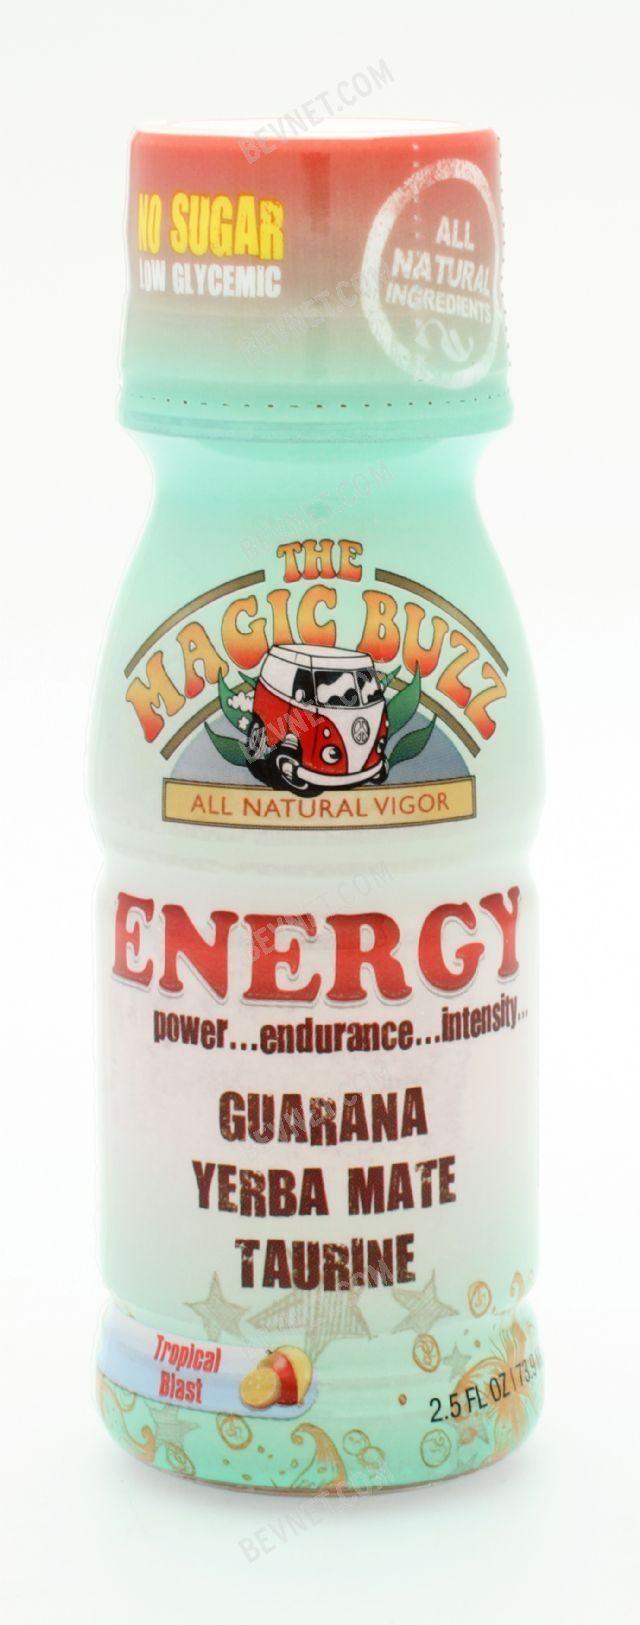 The Magic Buzz: